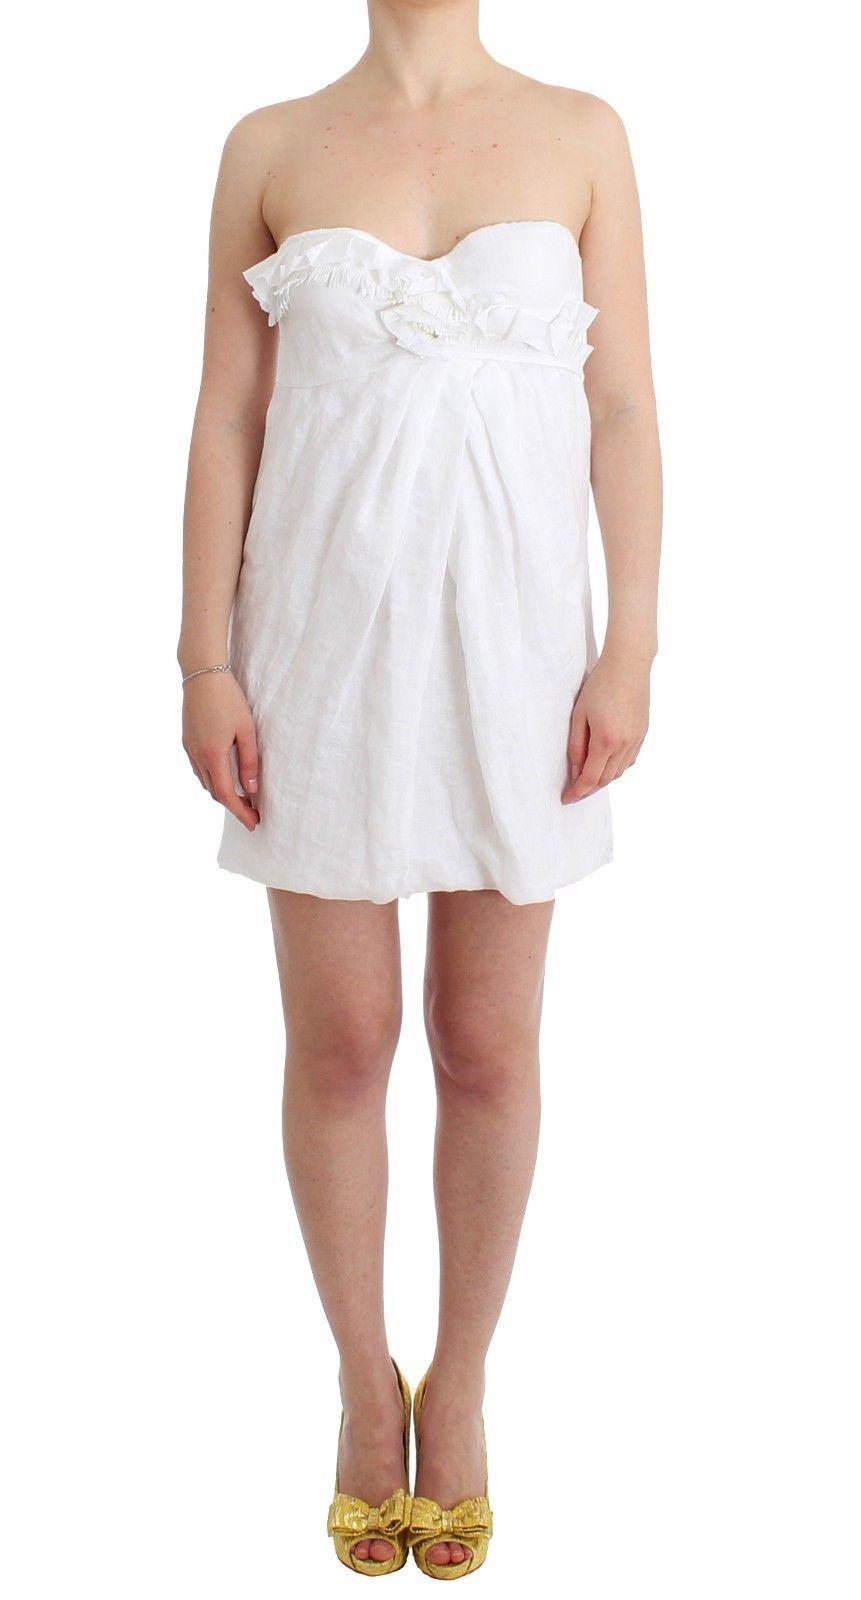 Ermanno Scervino Women's Dress White SIG11516 - IT44 | M